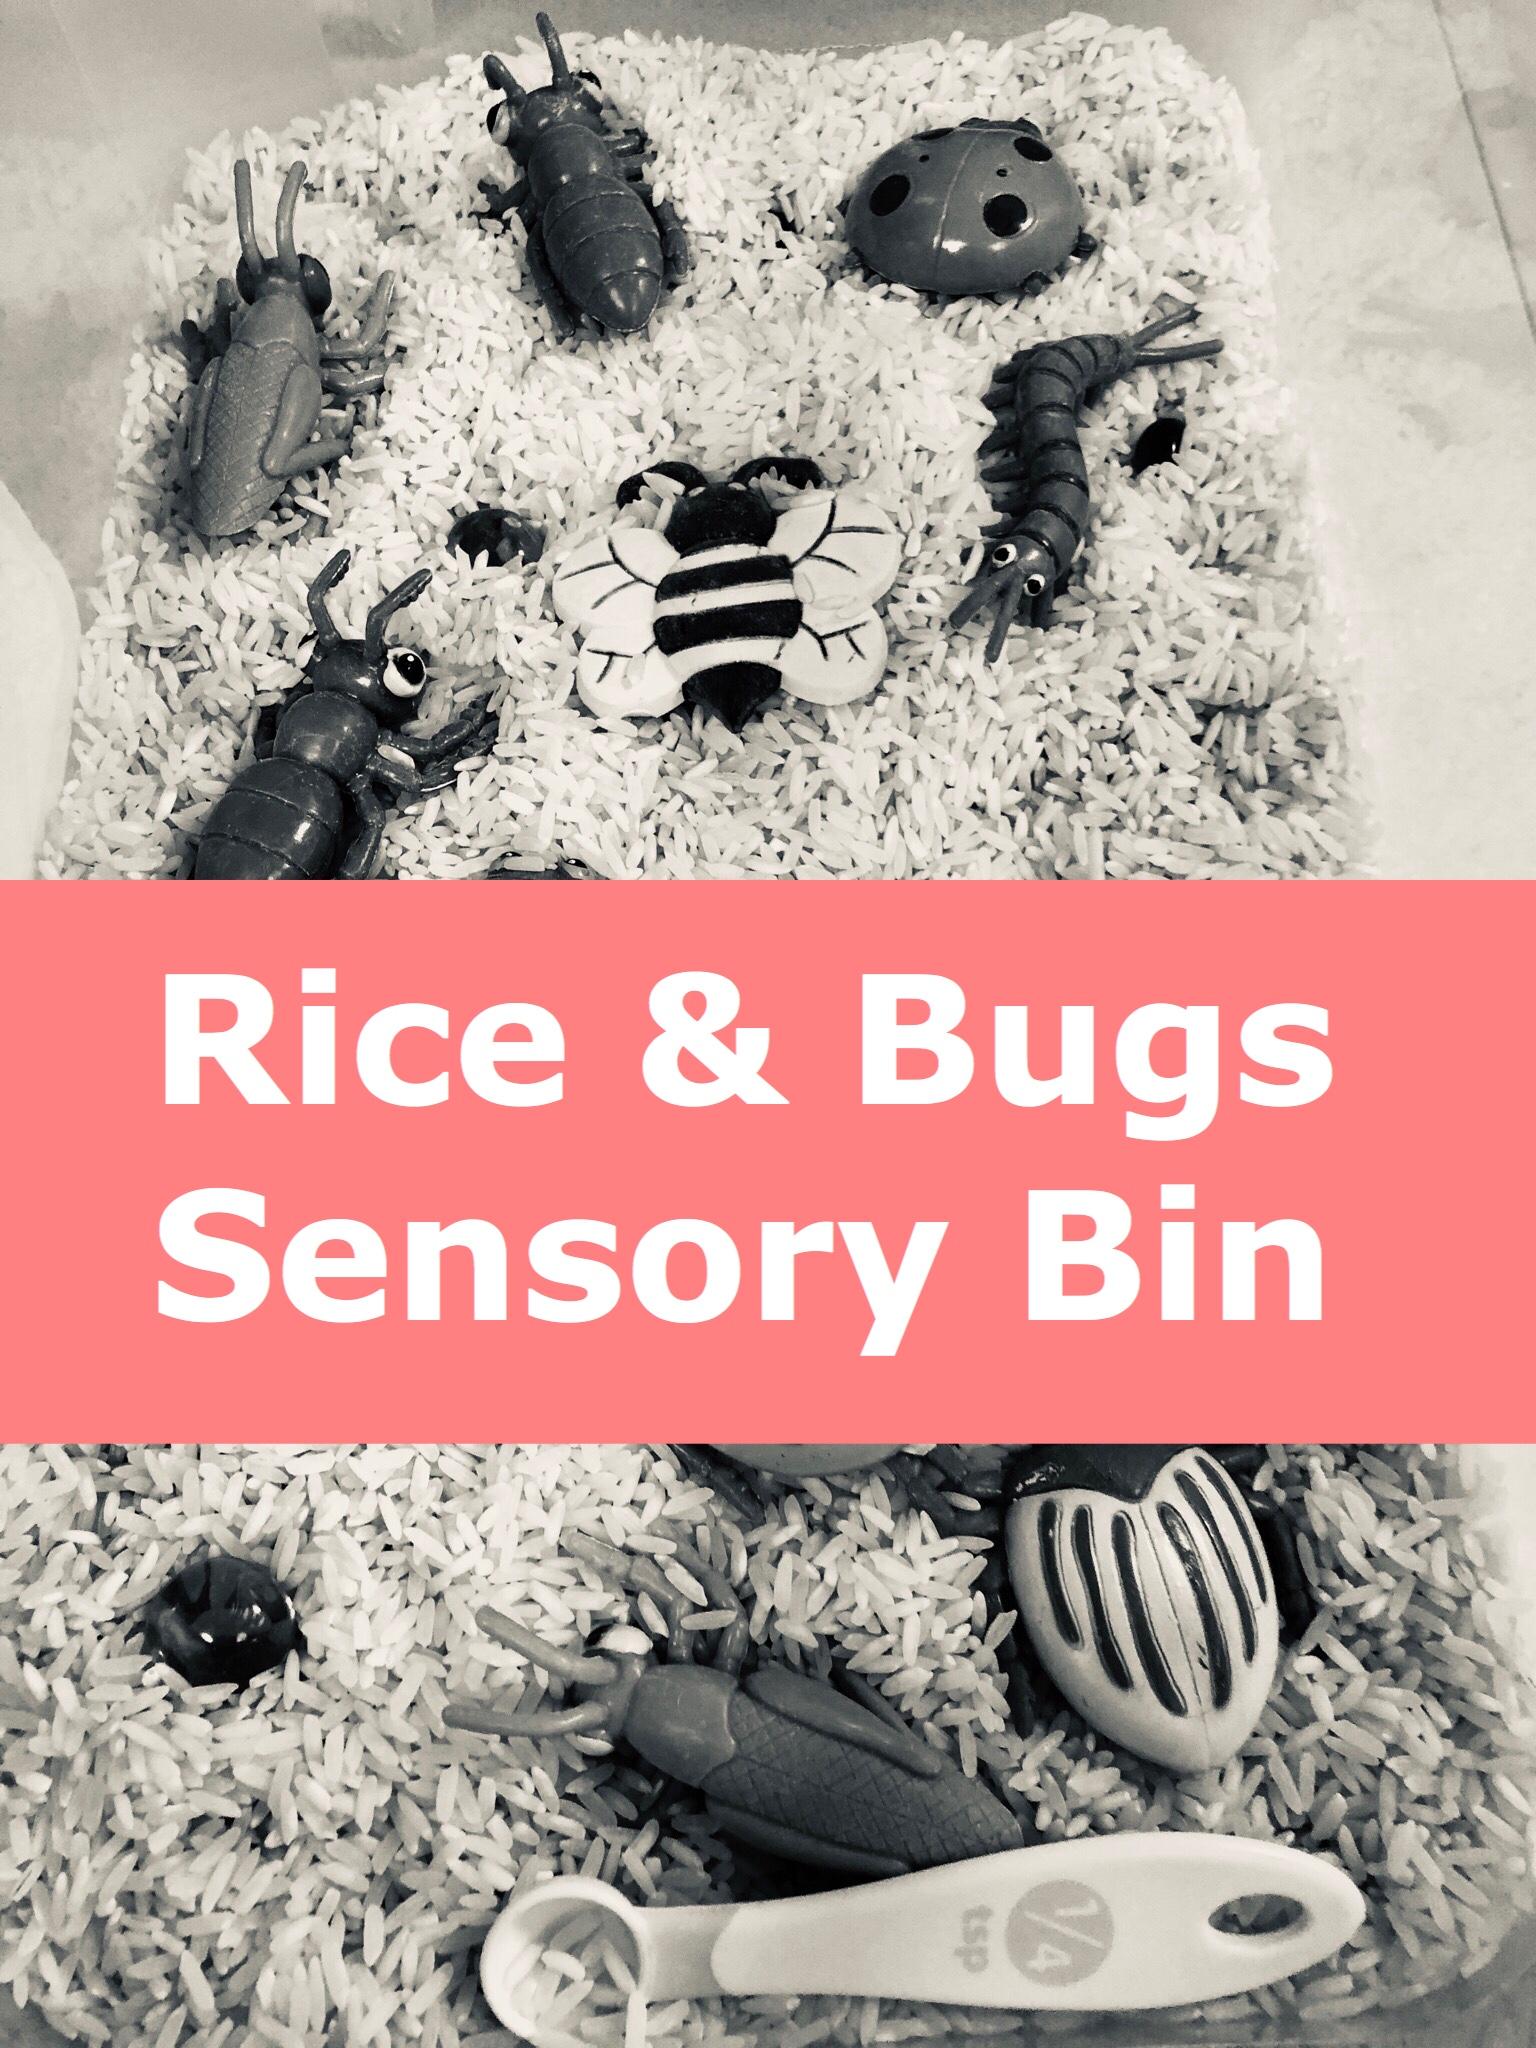 Rice & Bugs Sensory Bin pin